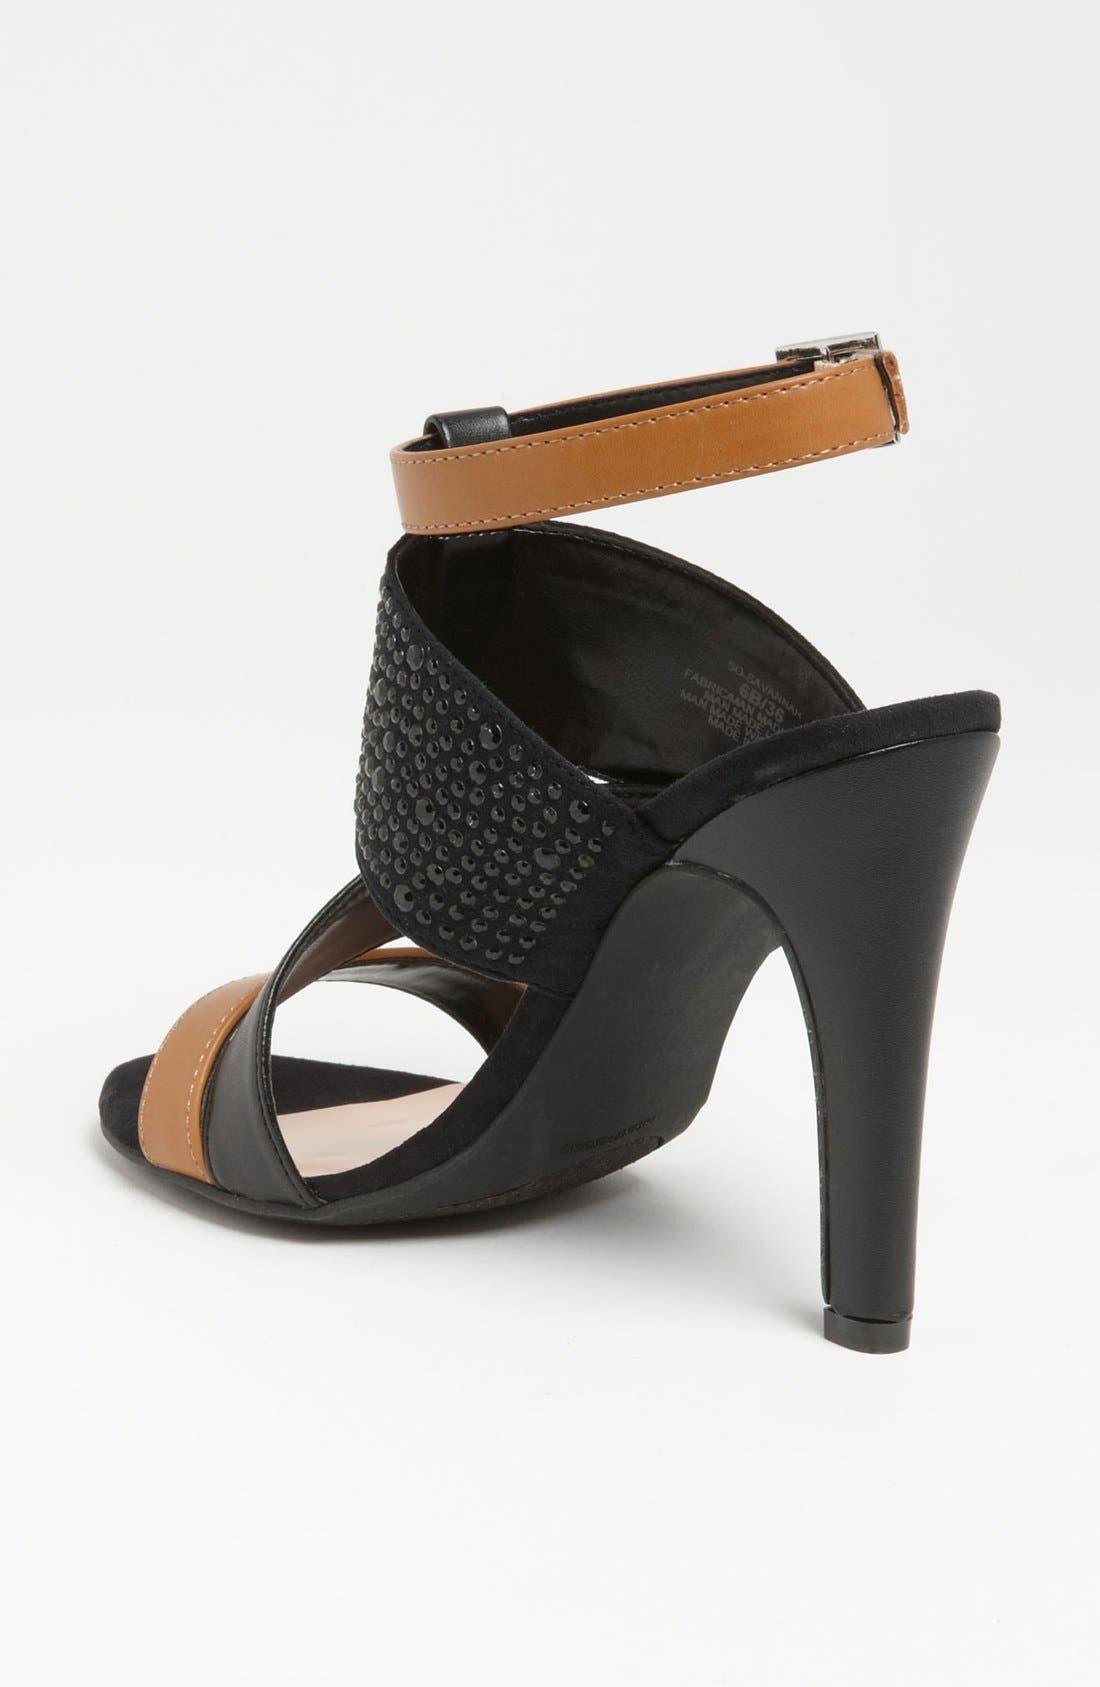 SOLE SOCIETY, 'Savannah' Sandal, Alternate thumbnail 2, color, 210